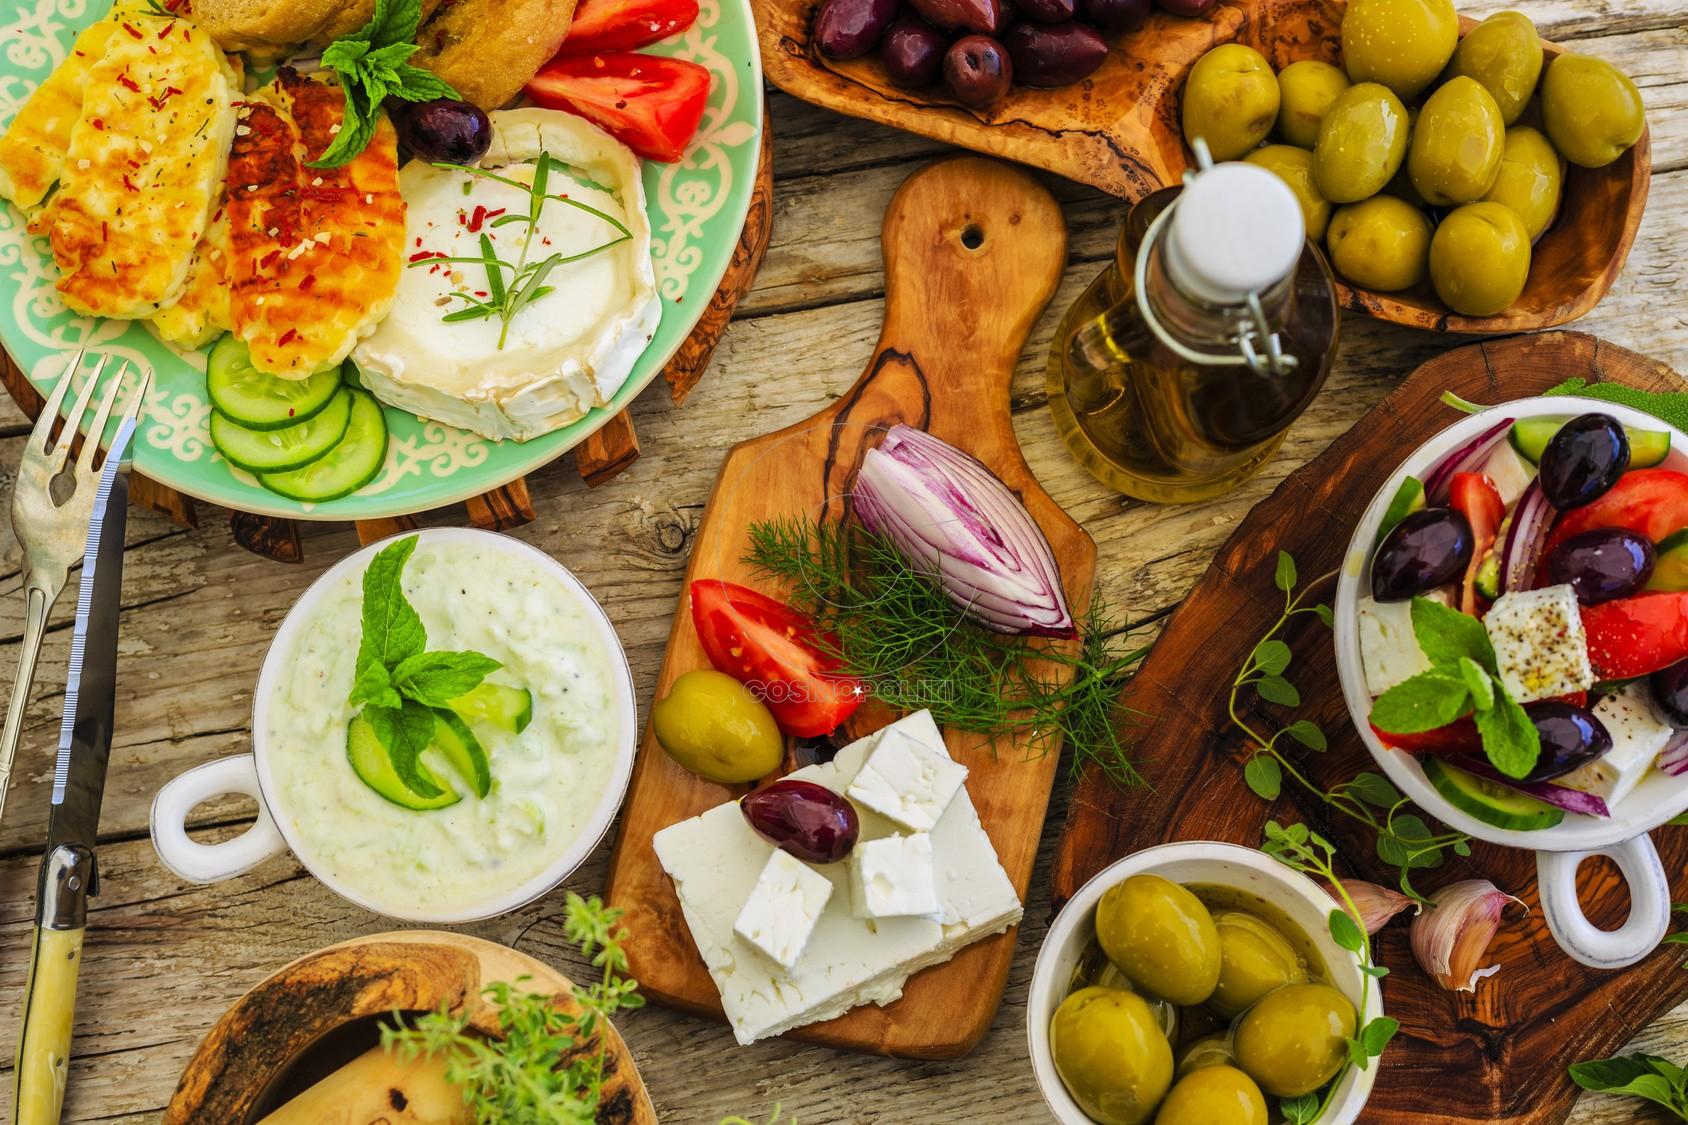 Greek cuisine dishes - Greek salad, choriatiki, halloumi, tzatziki